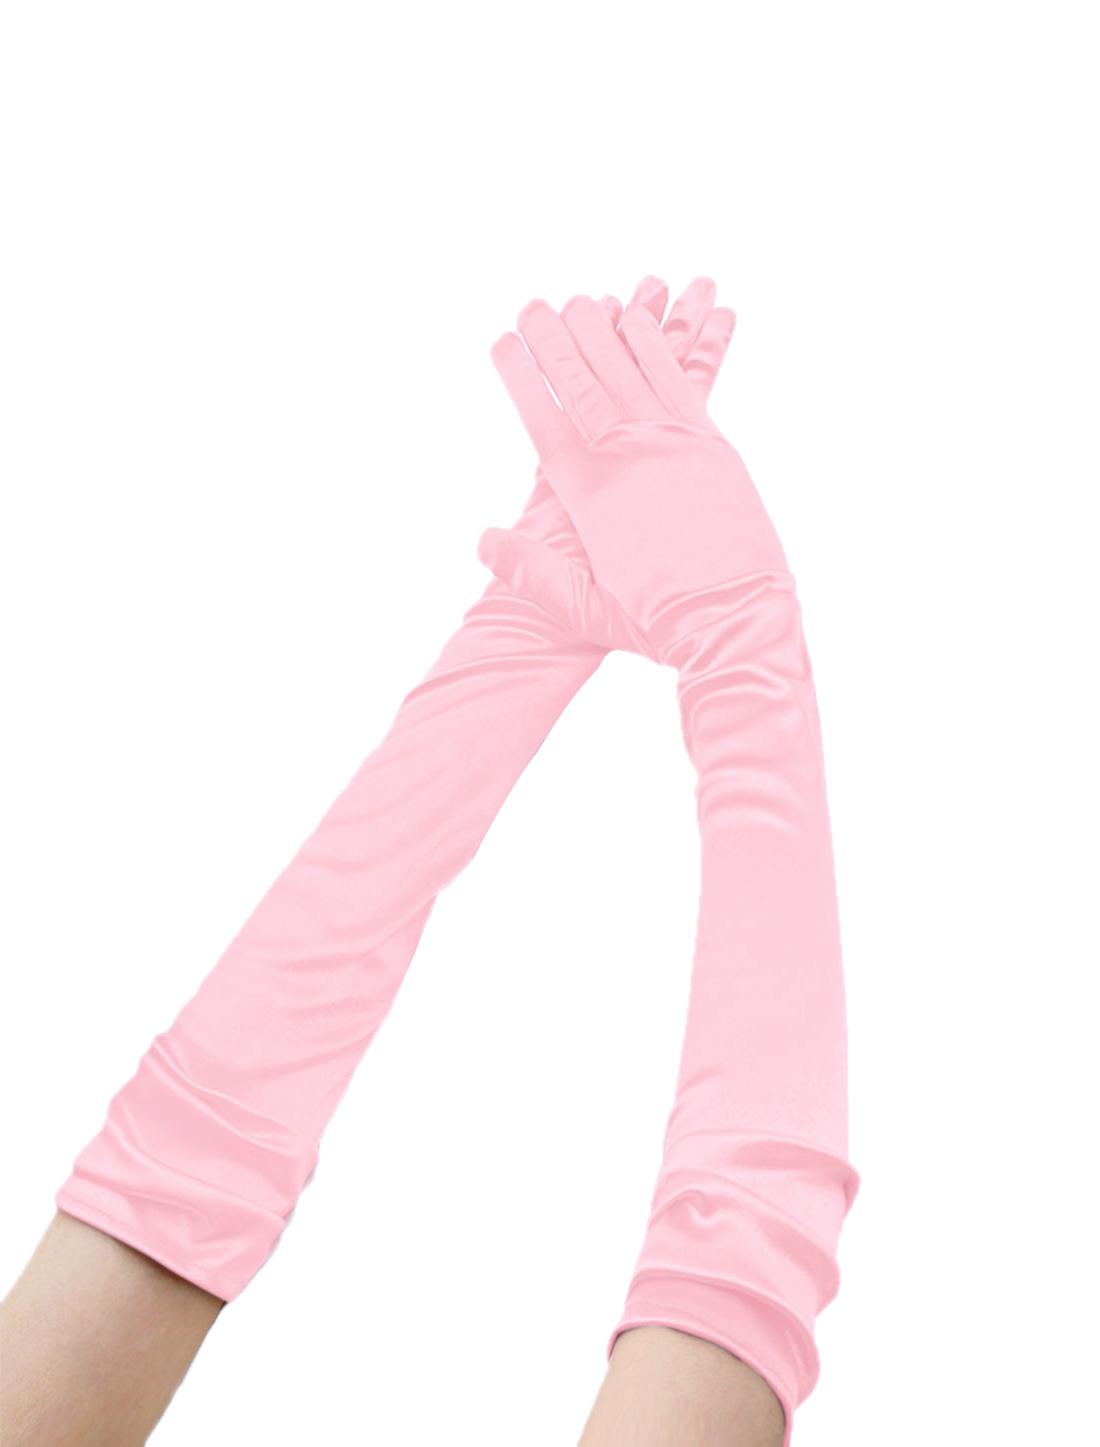 Women Shiny Stretchy Opera Length Full Finger Gloves Pair Pink